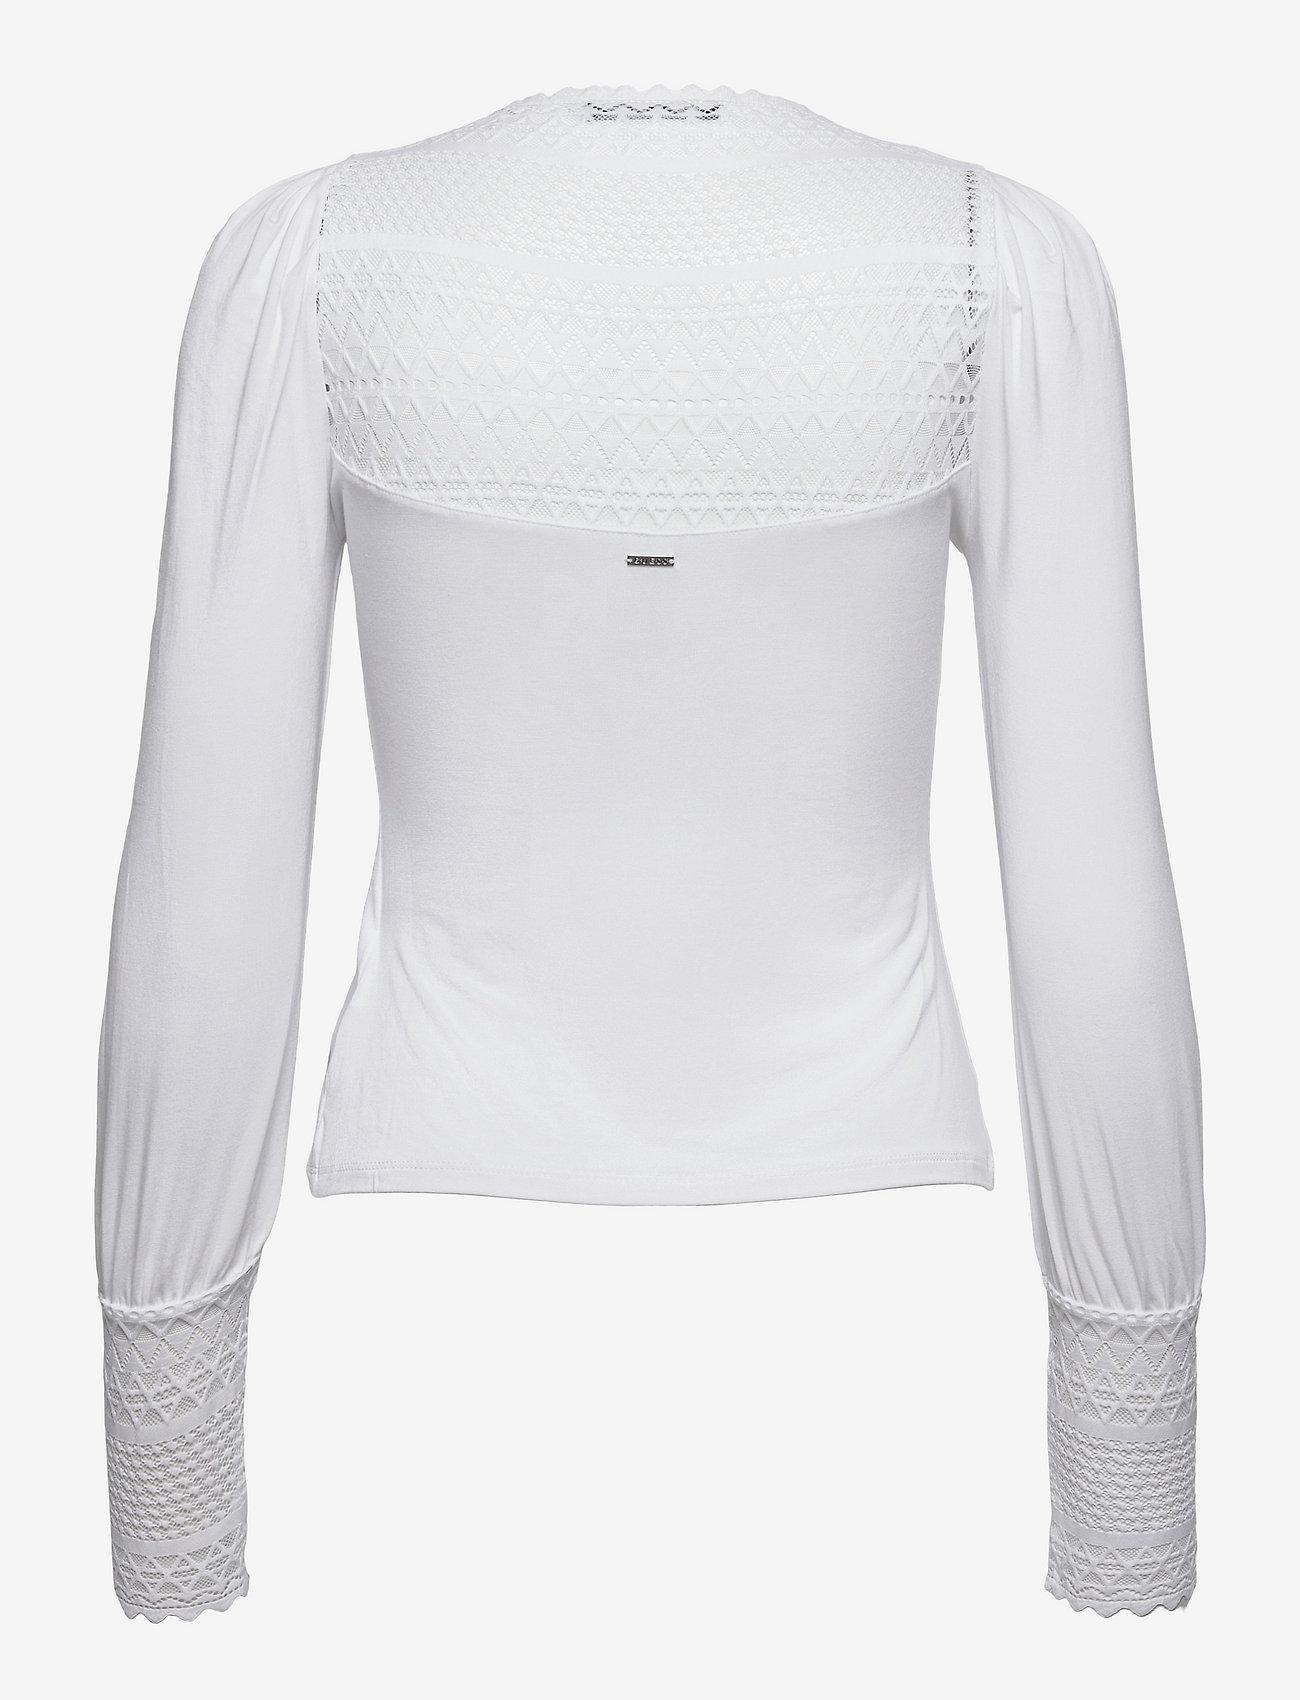 GUESS Jeans - LS LATIFE TOP - långärmade blusar - pure white - 1